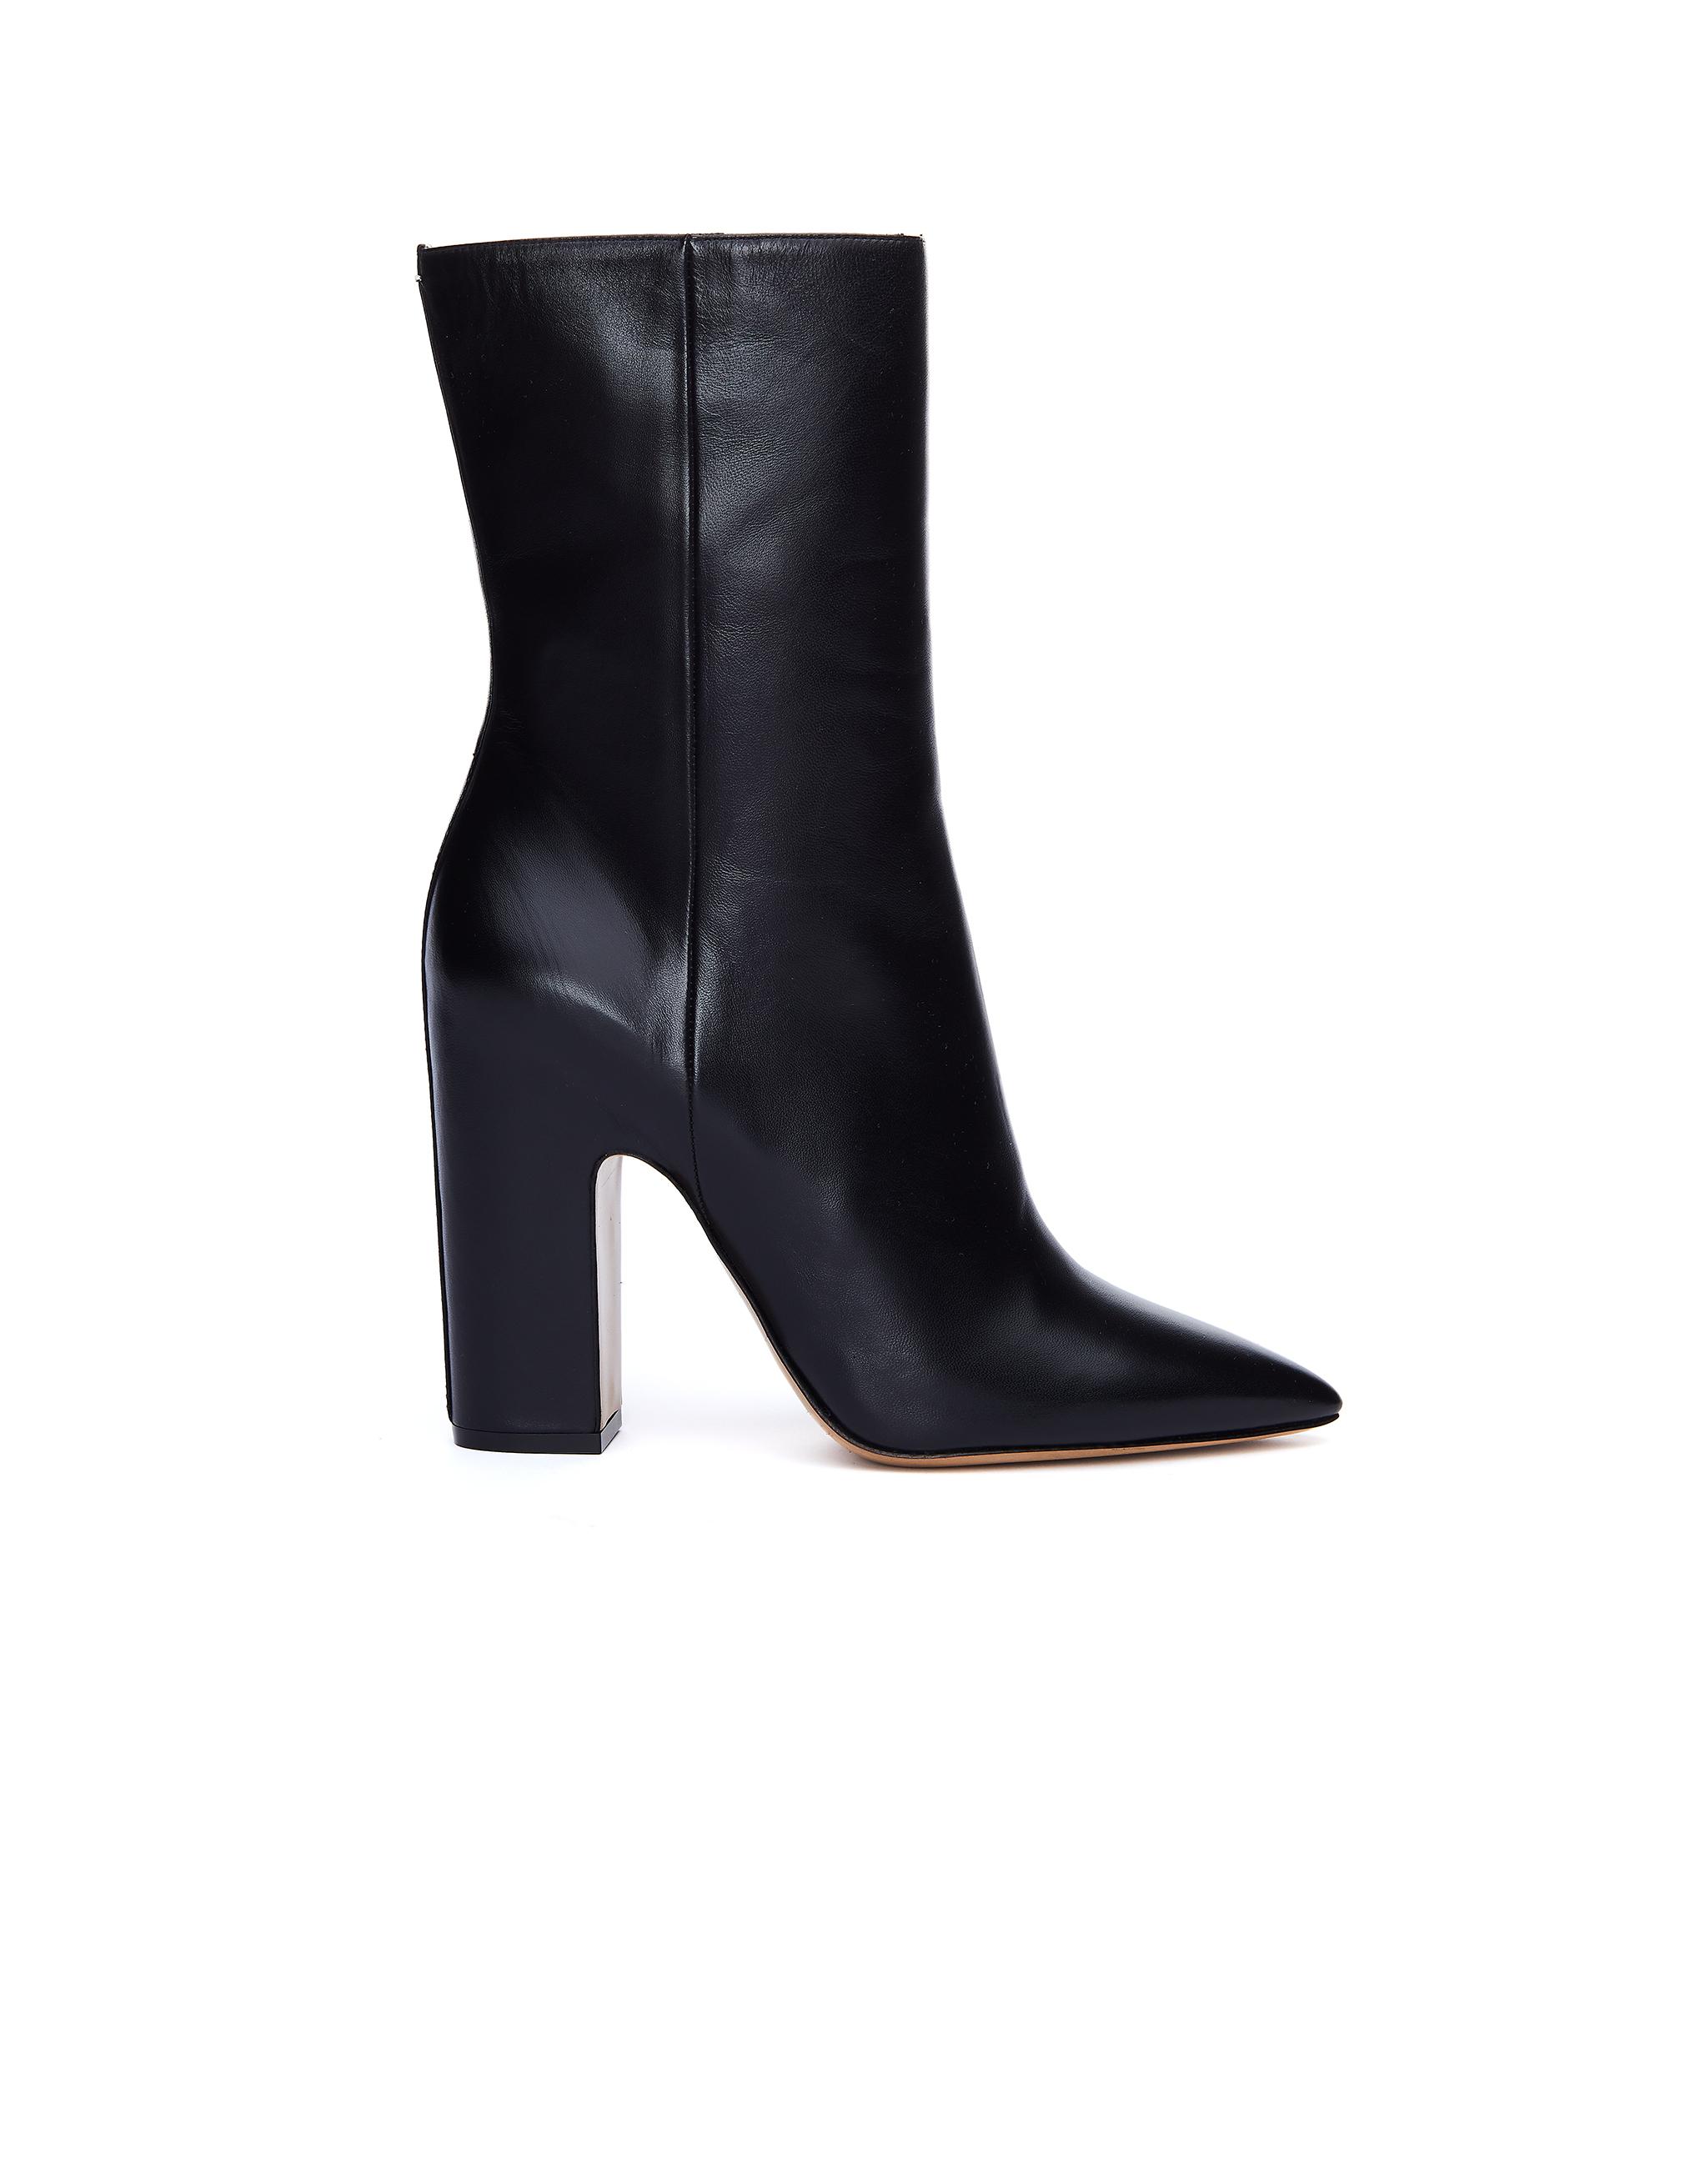 Maison Margiela Pointed Toe Black Leather Boots